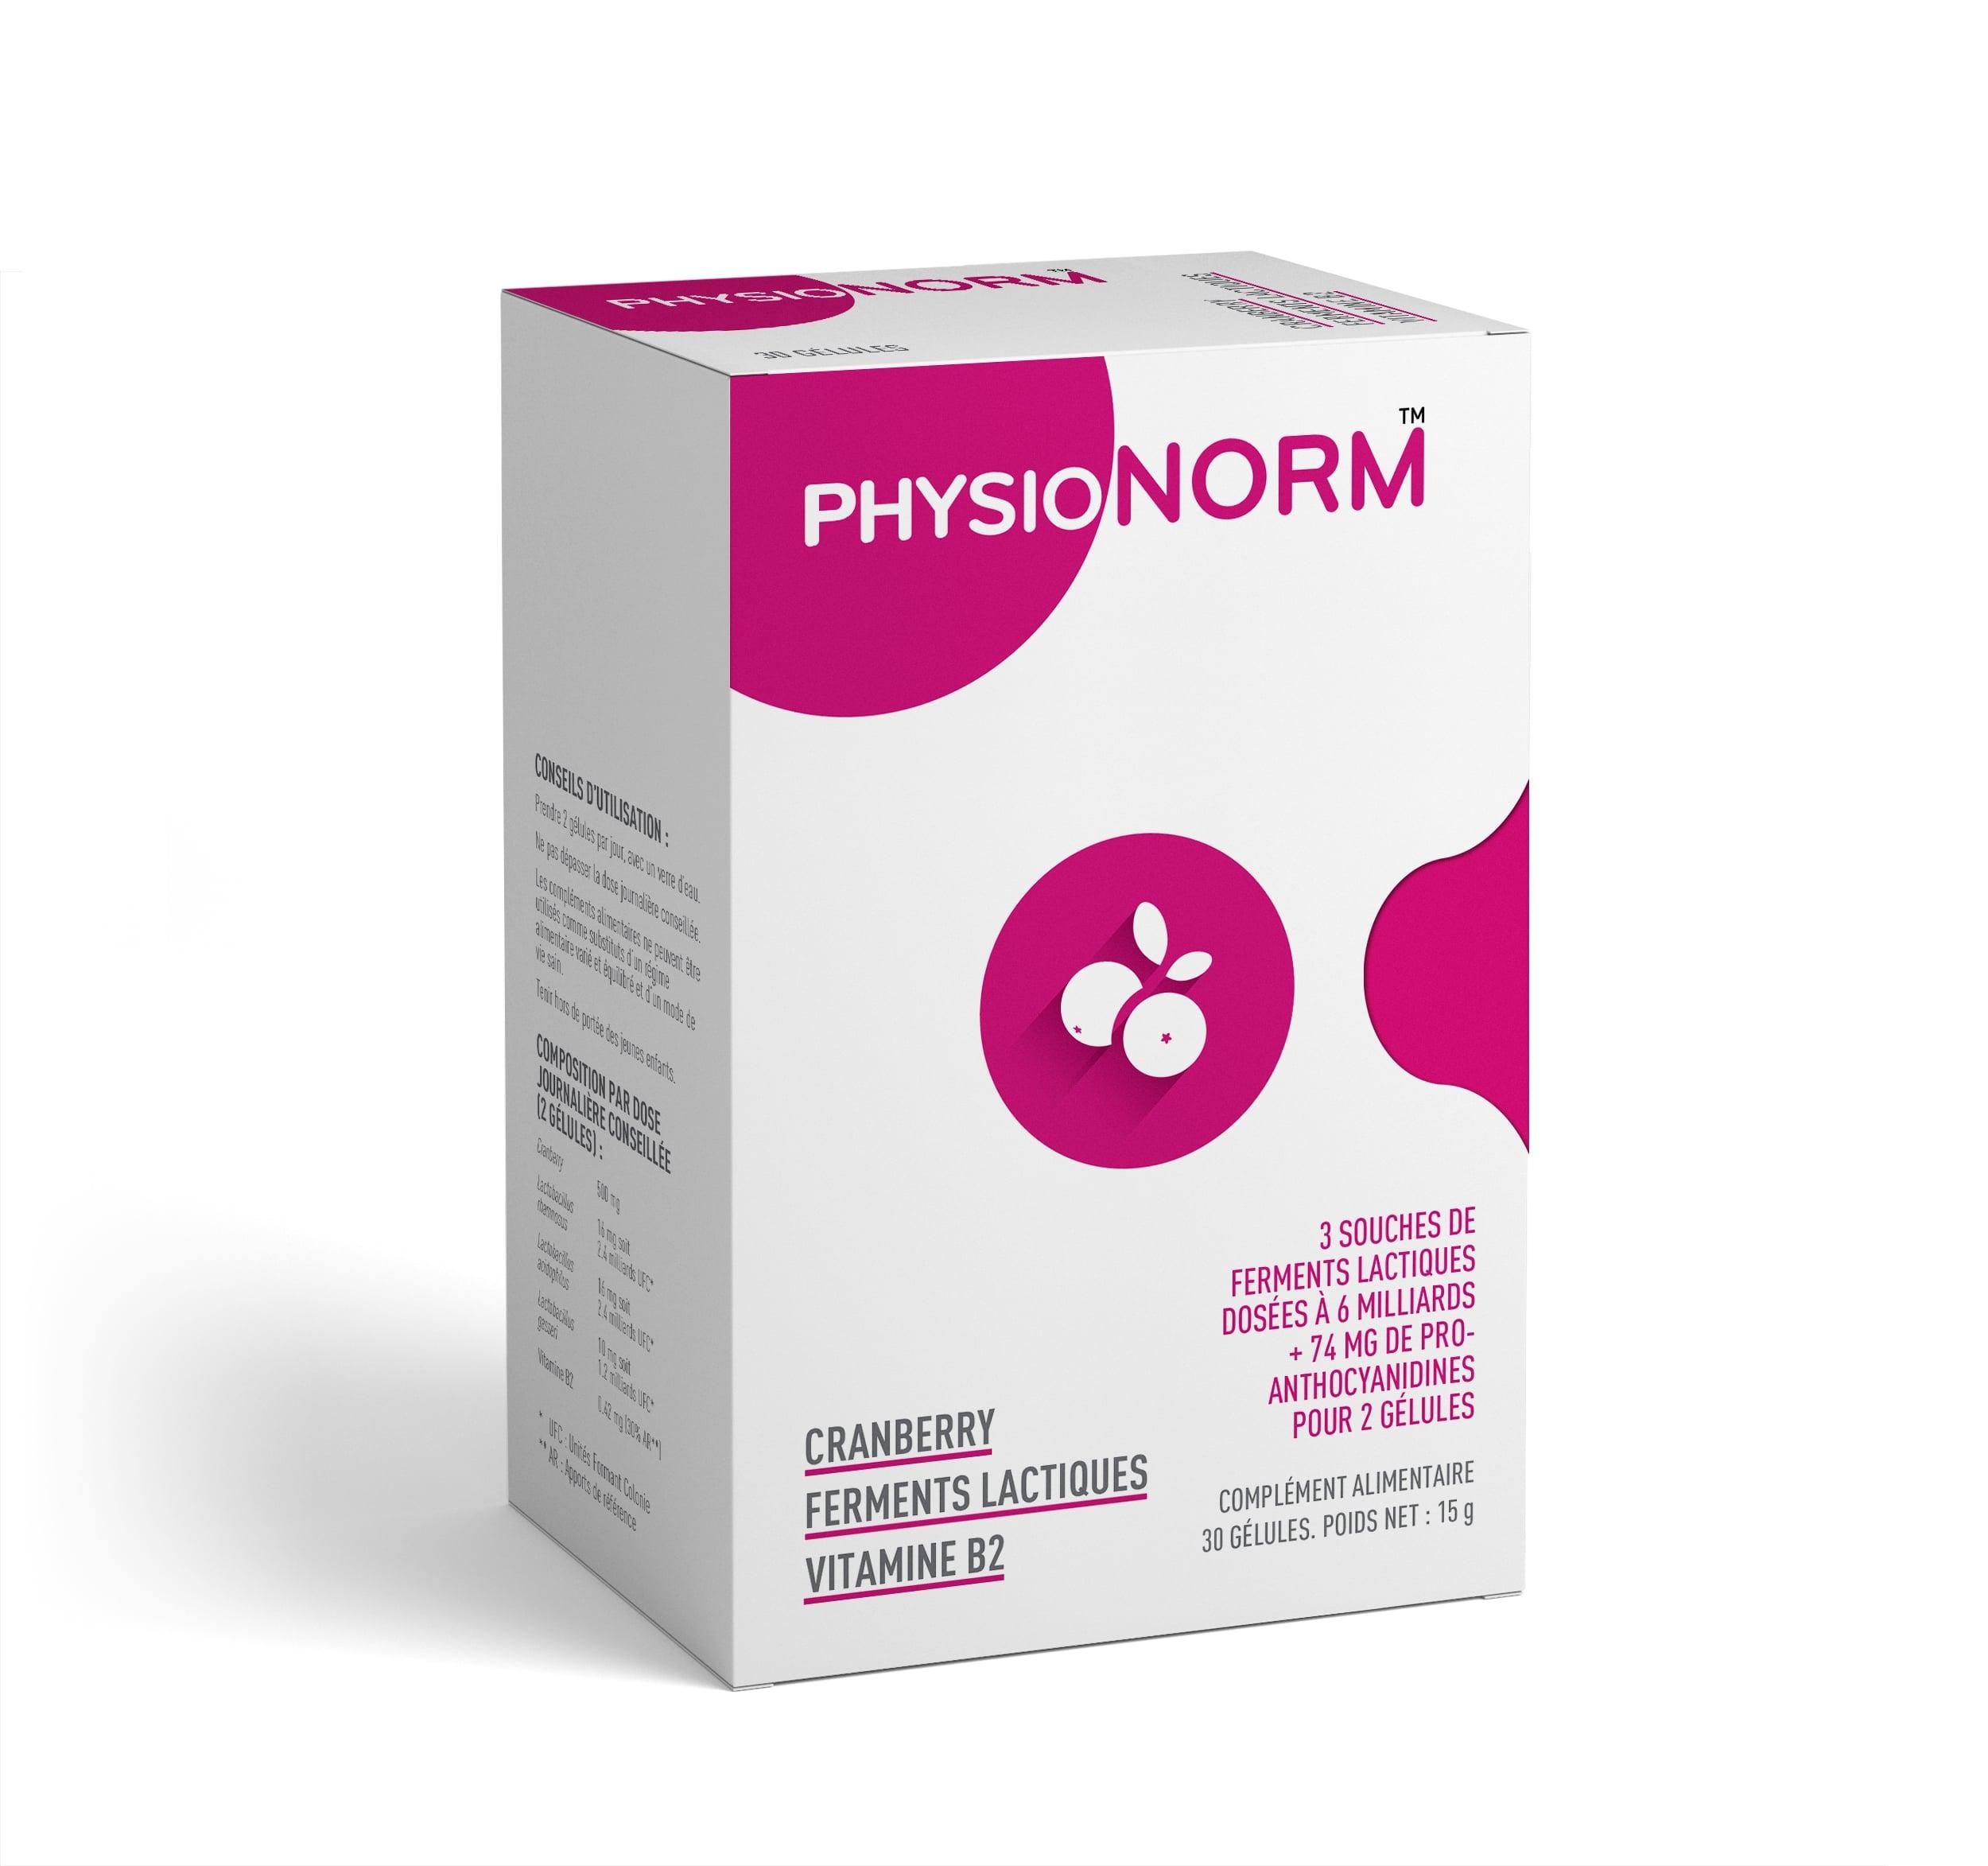 Laboratoire-Immubio-complement-alimentaire-PhysioNorm-CRANBERRY